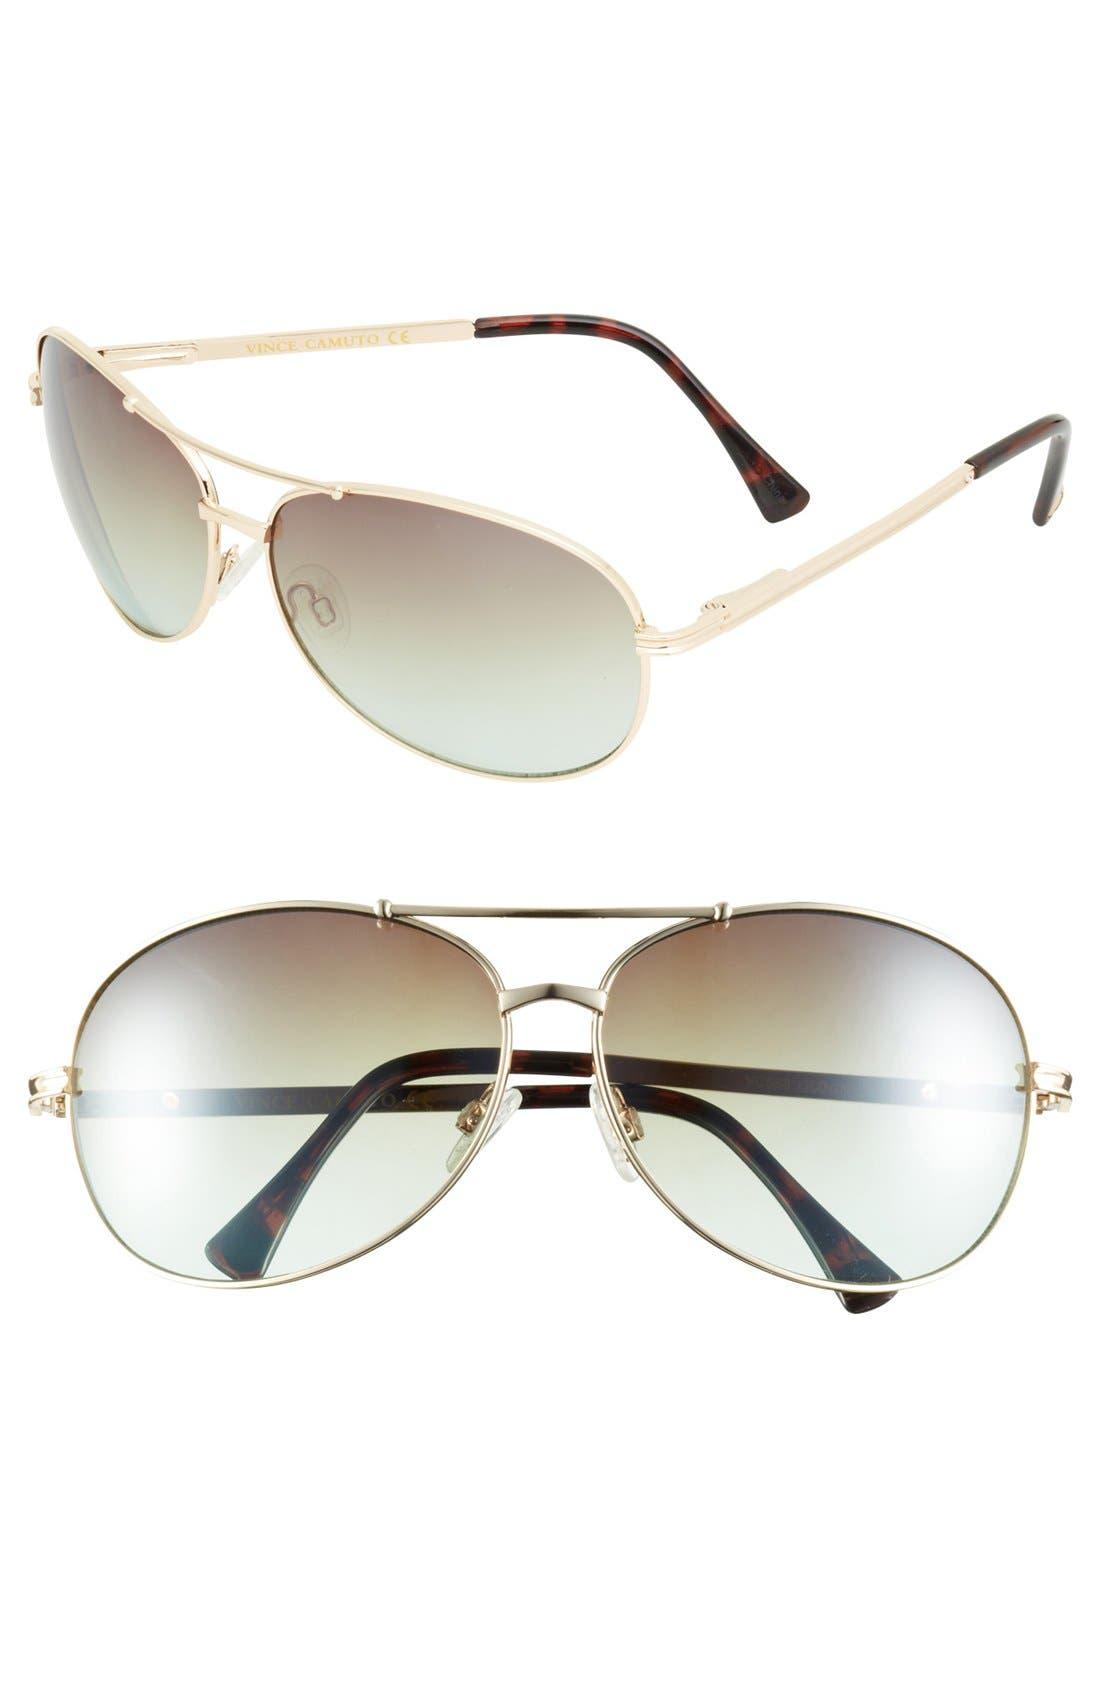 Alternate Image 1 Selected - Vince Camuto 65mm Aviator Sunglasses